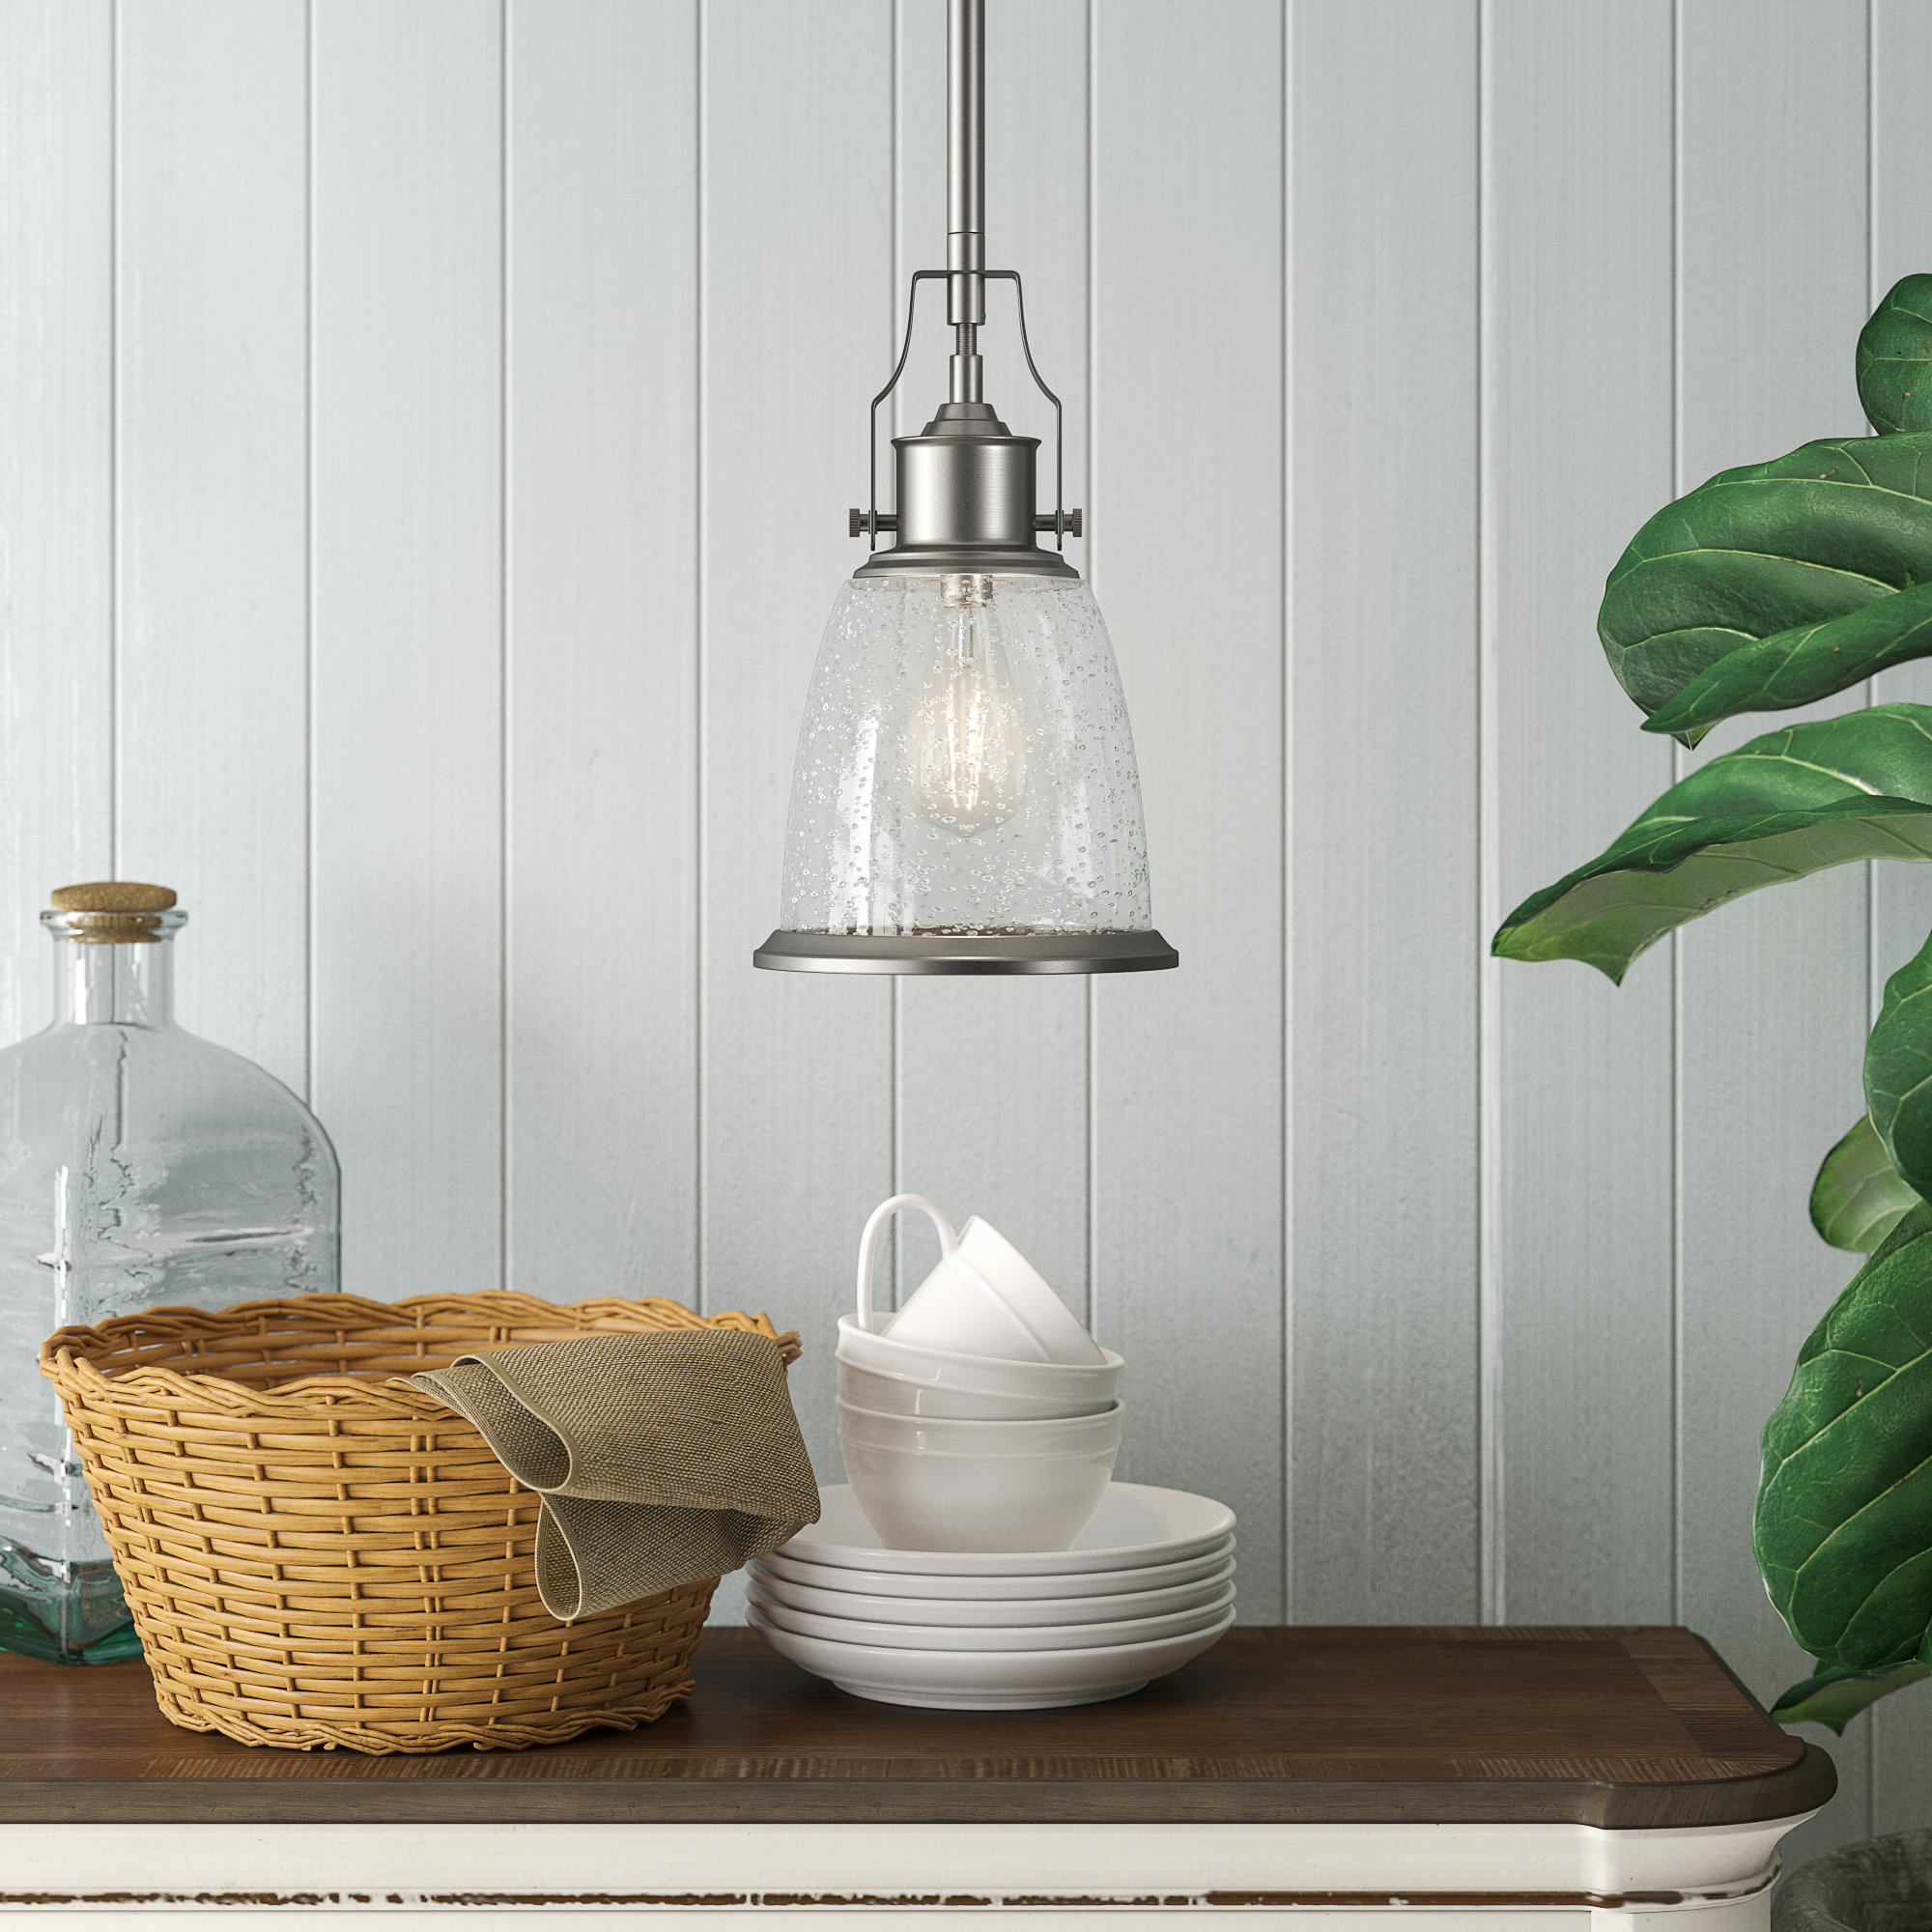 Kathi 1 Light Cone Pendant Within 2019 Devereaux 1 Light Single Globe Pendants (Gallery 3 of 25)